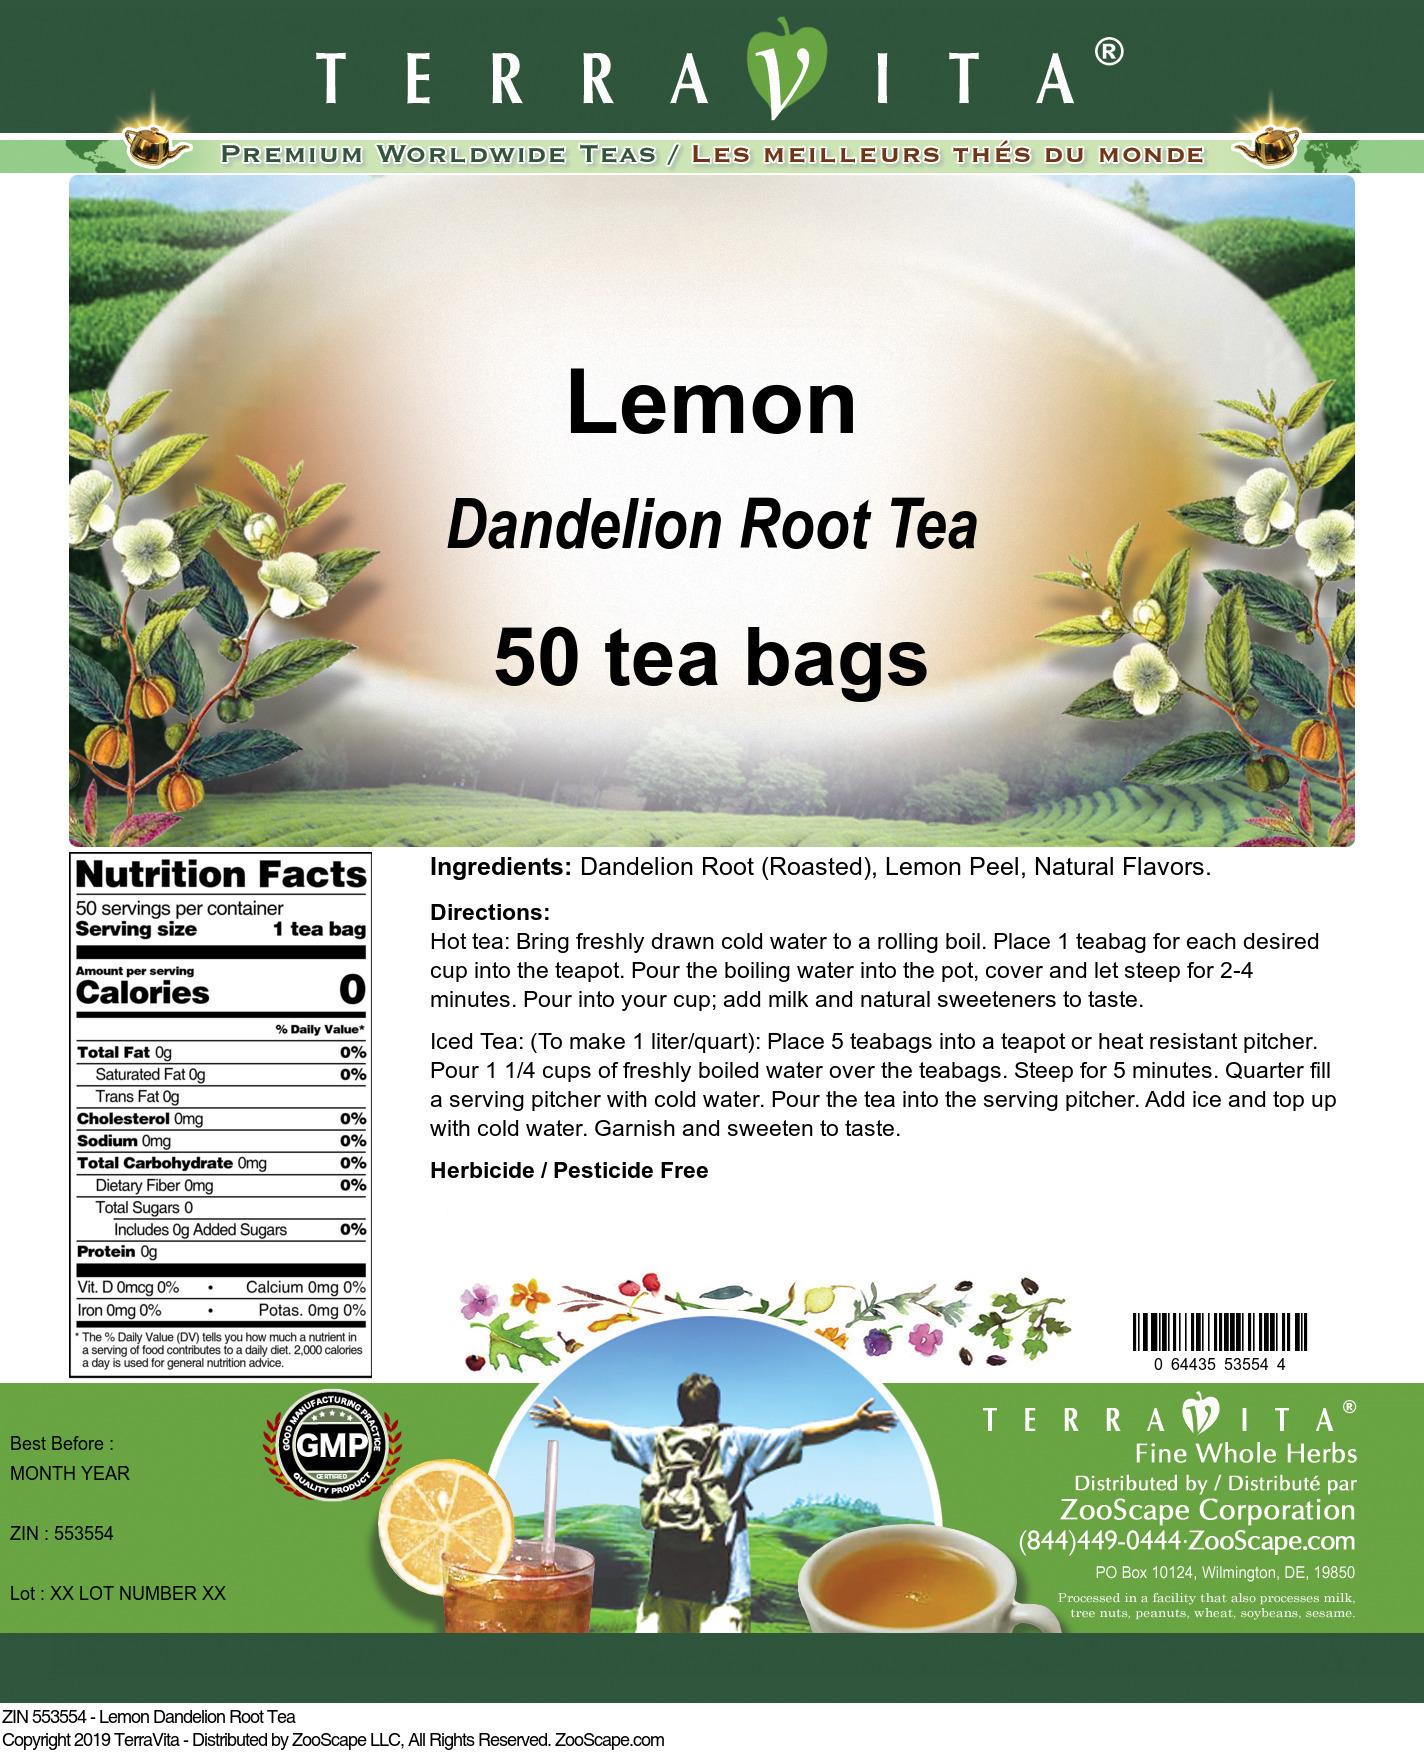 Lemon Dandelion Root Tea